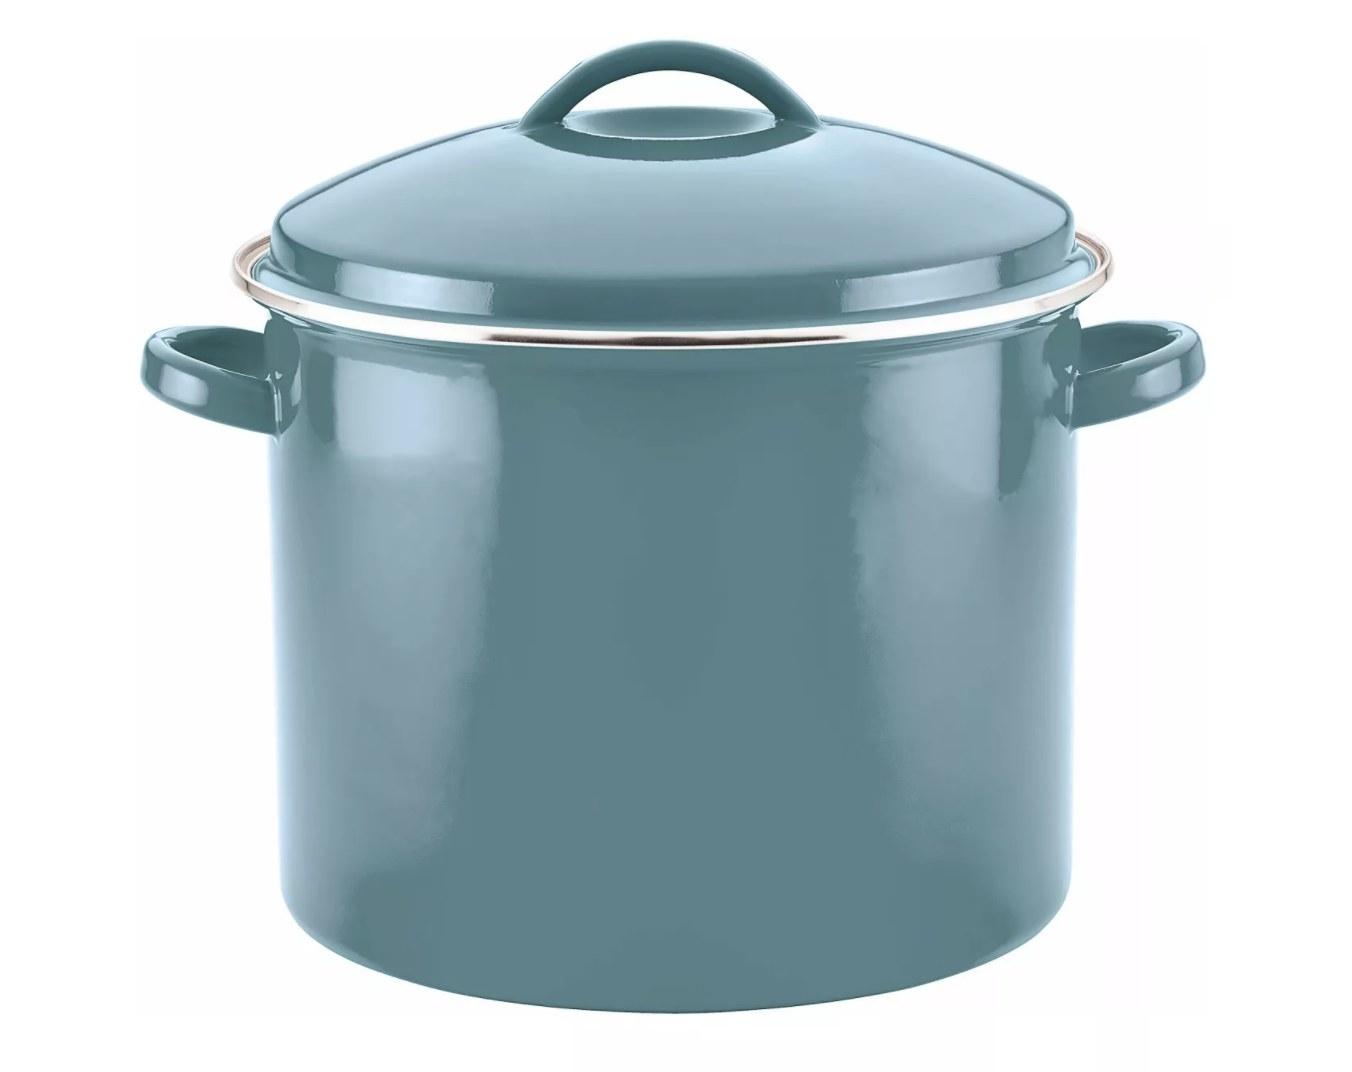 the stock pot